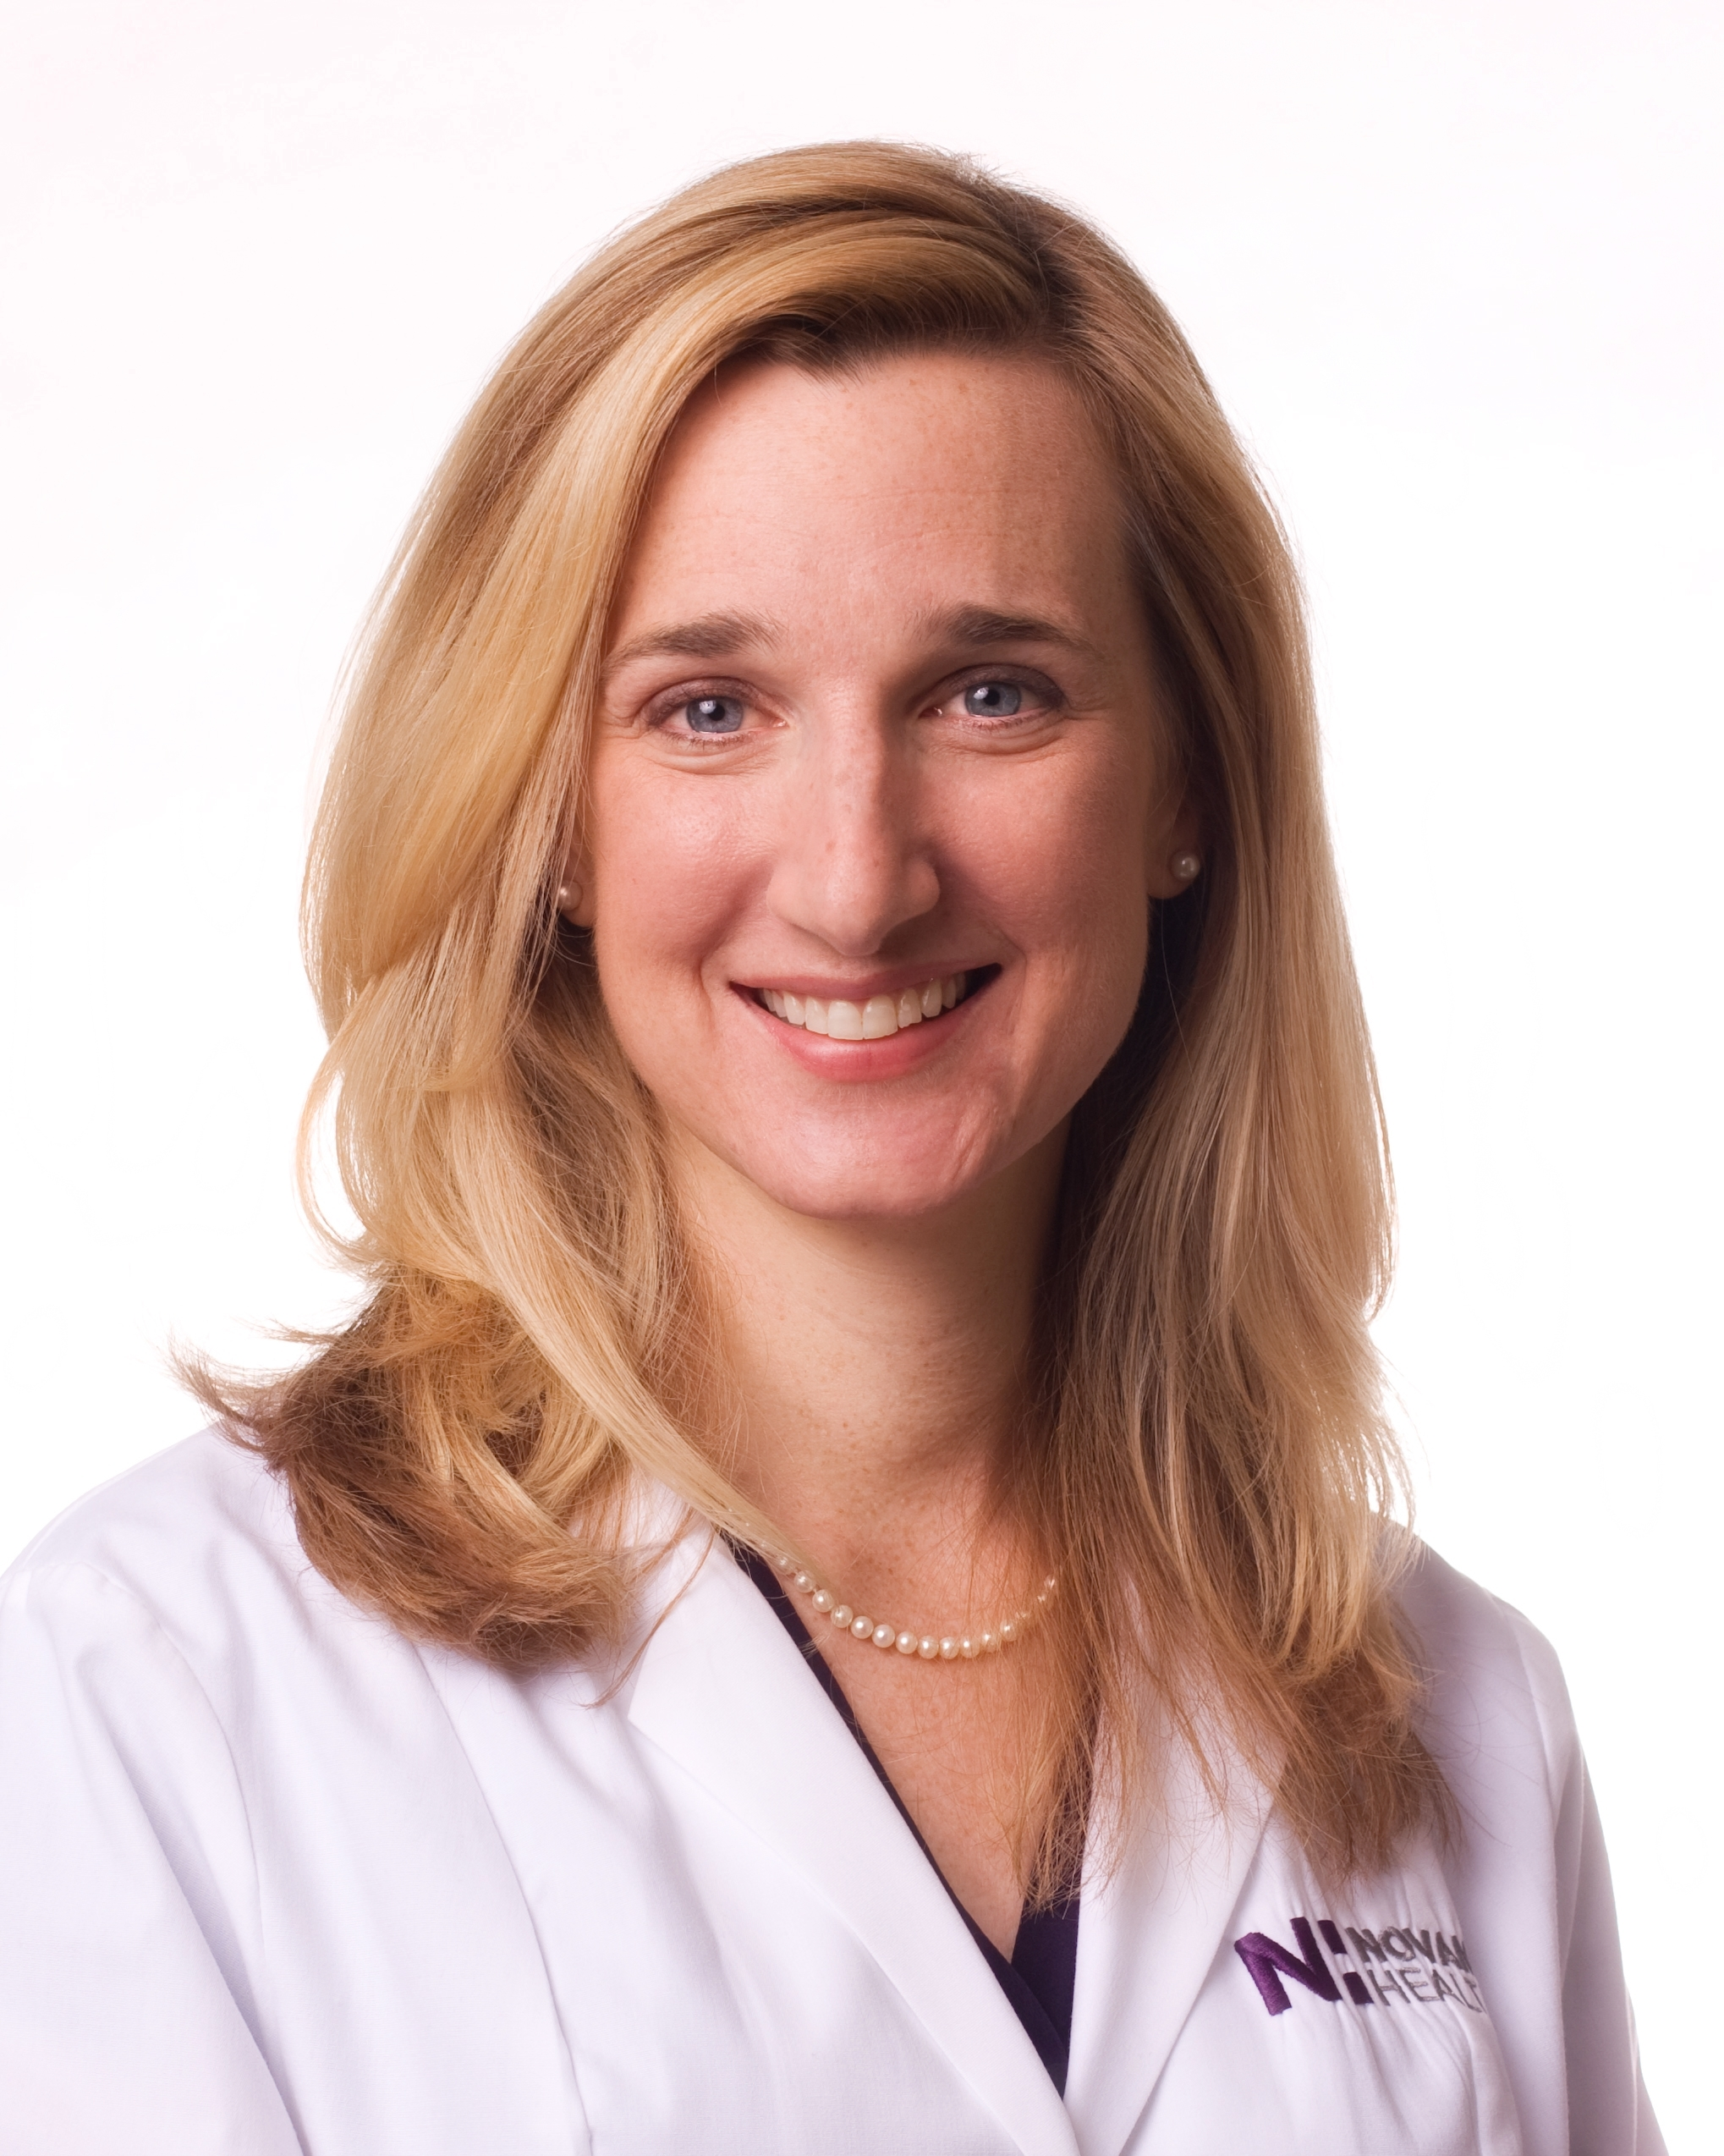 Dr. Katherine Addison